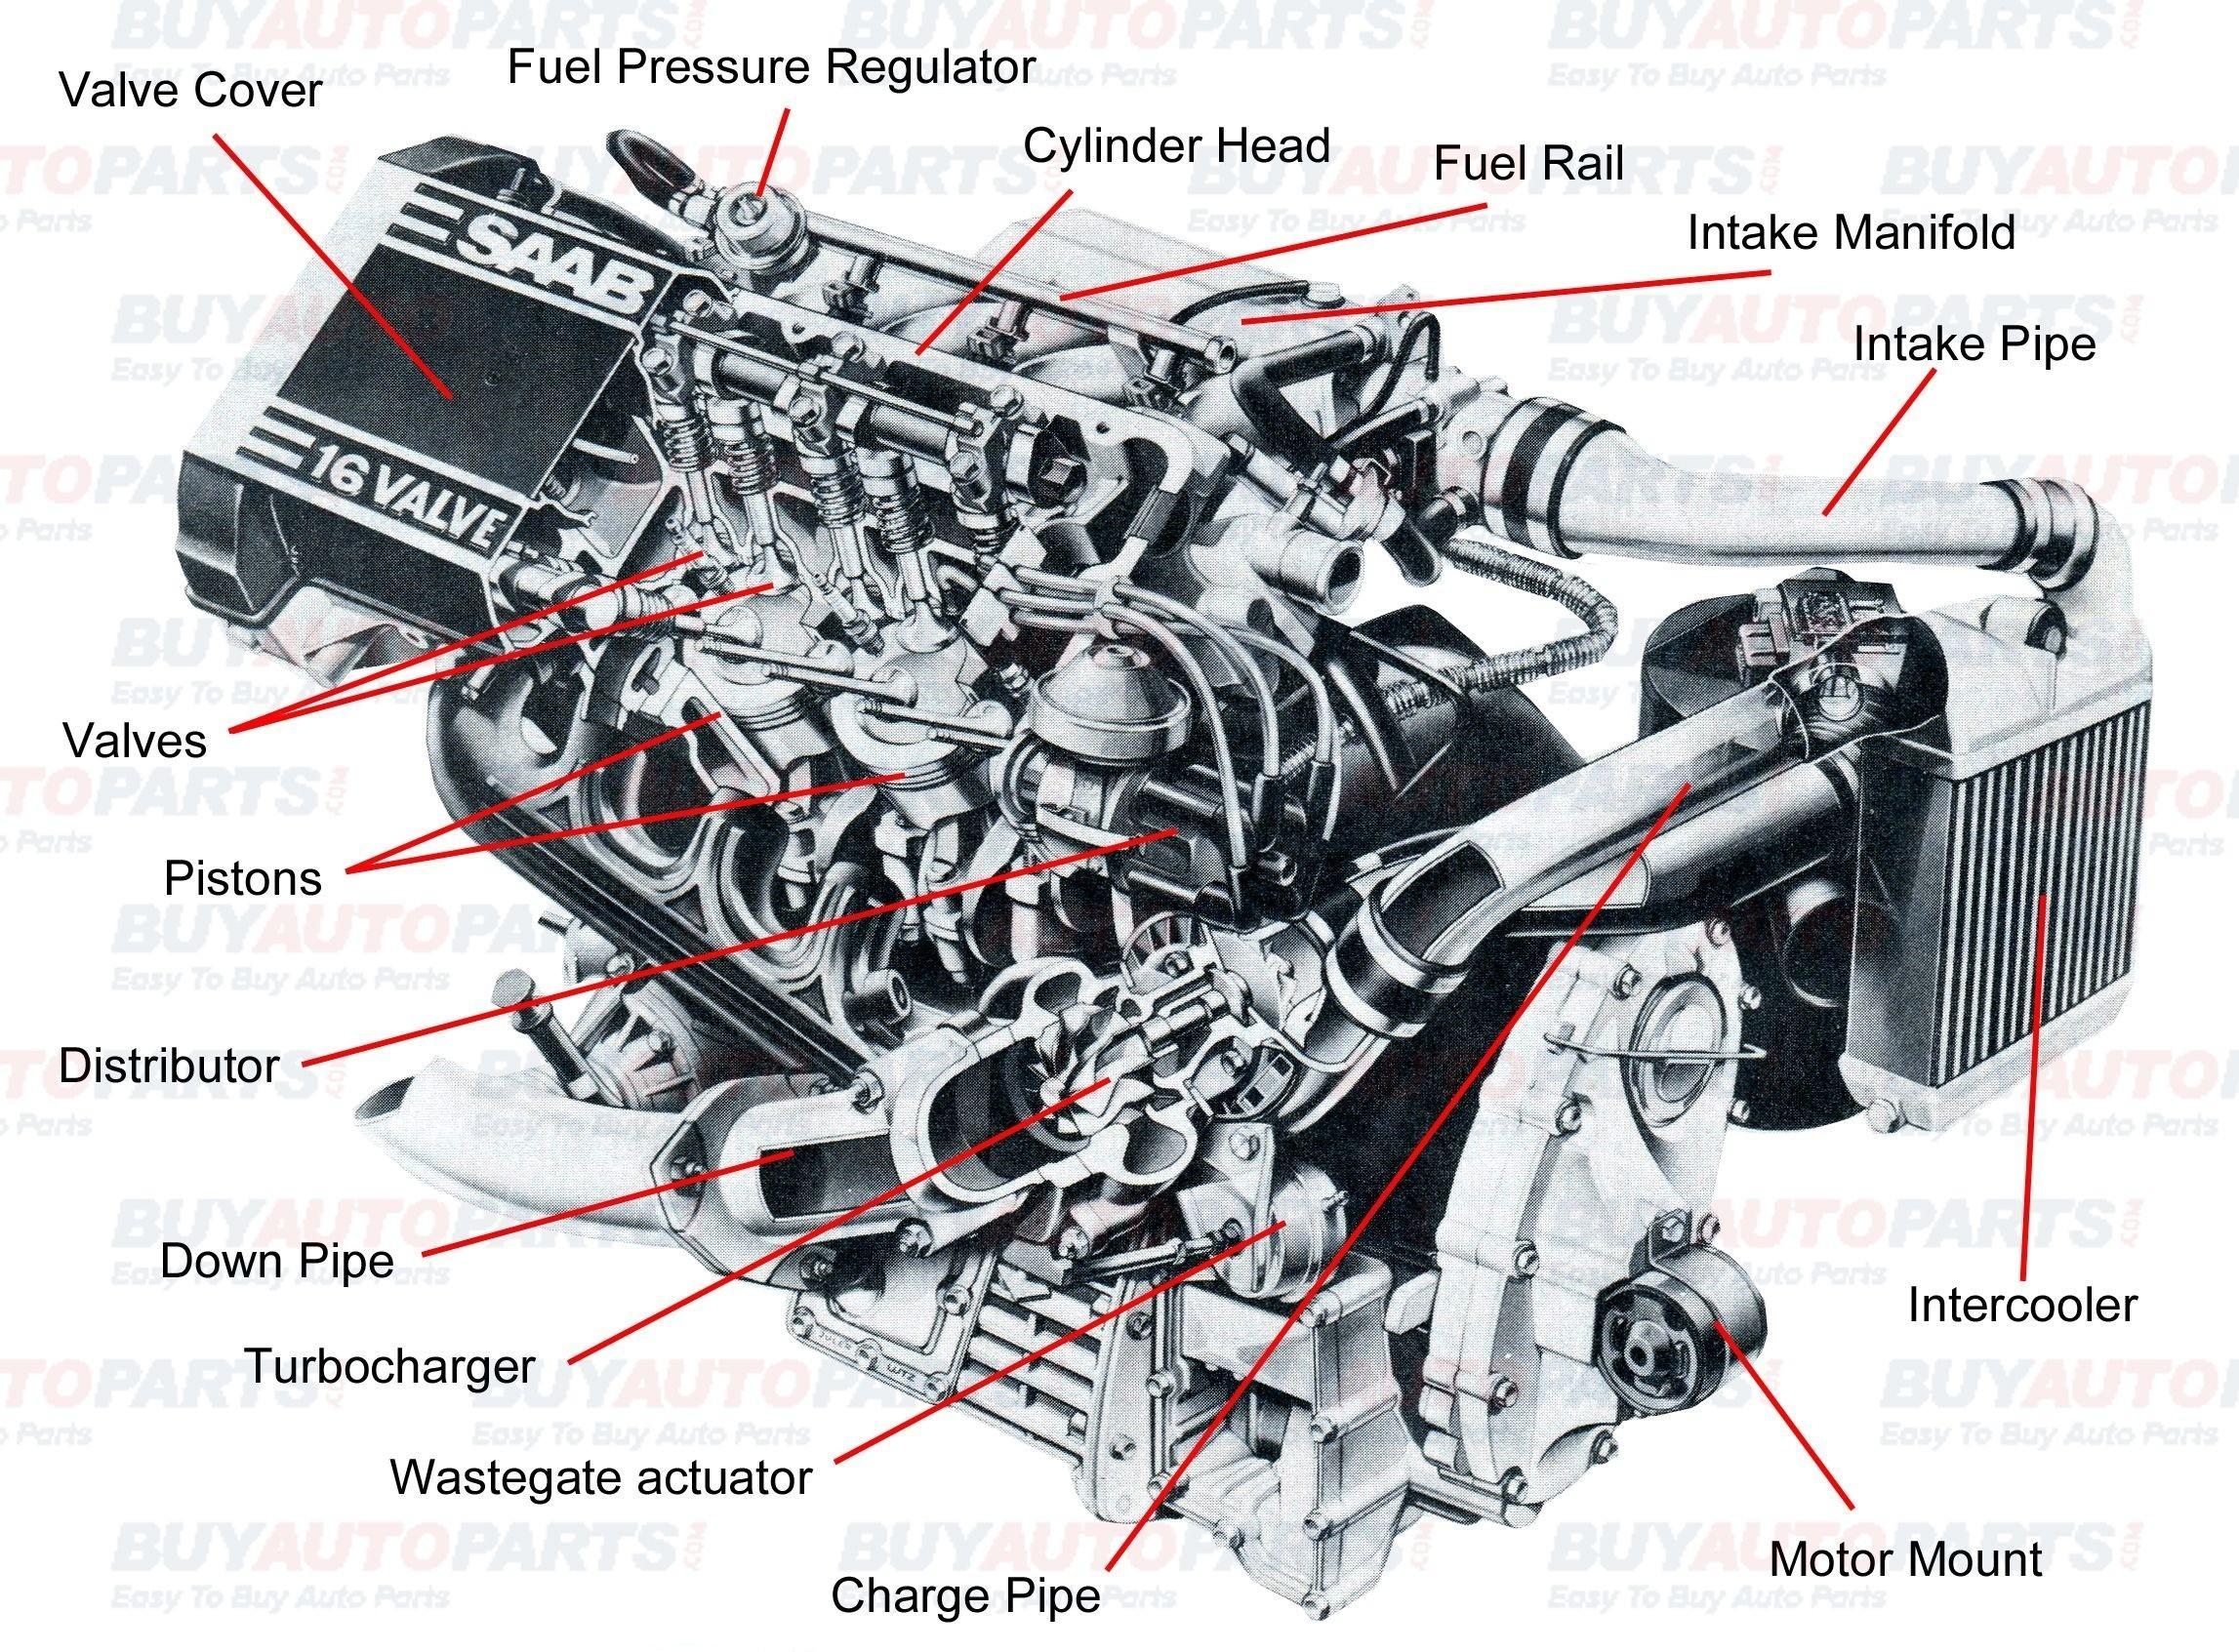 Diagram Showing Car Parts Car Valve Image New Car Diagram Unique Car Parts and Diagrams Of Diagram Showing Car Parts